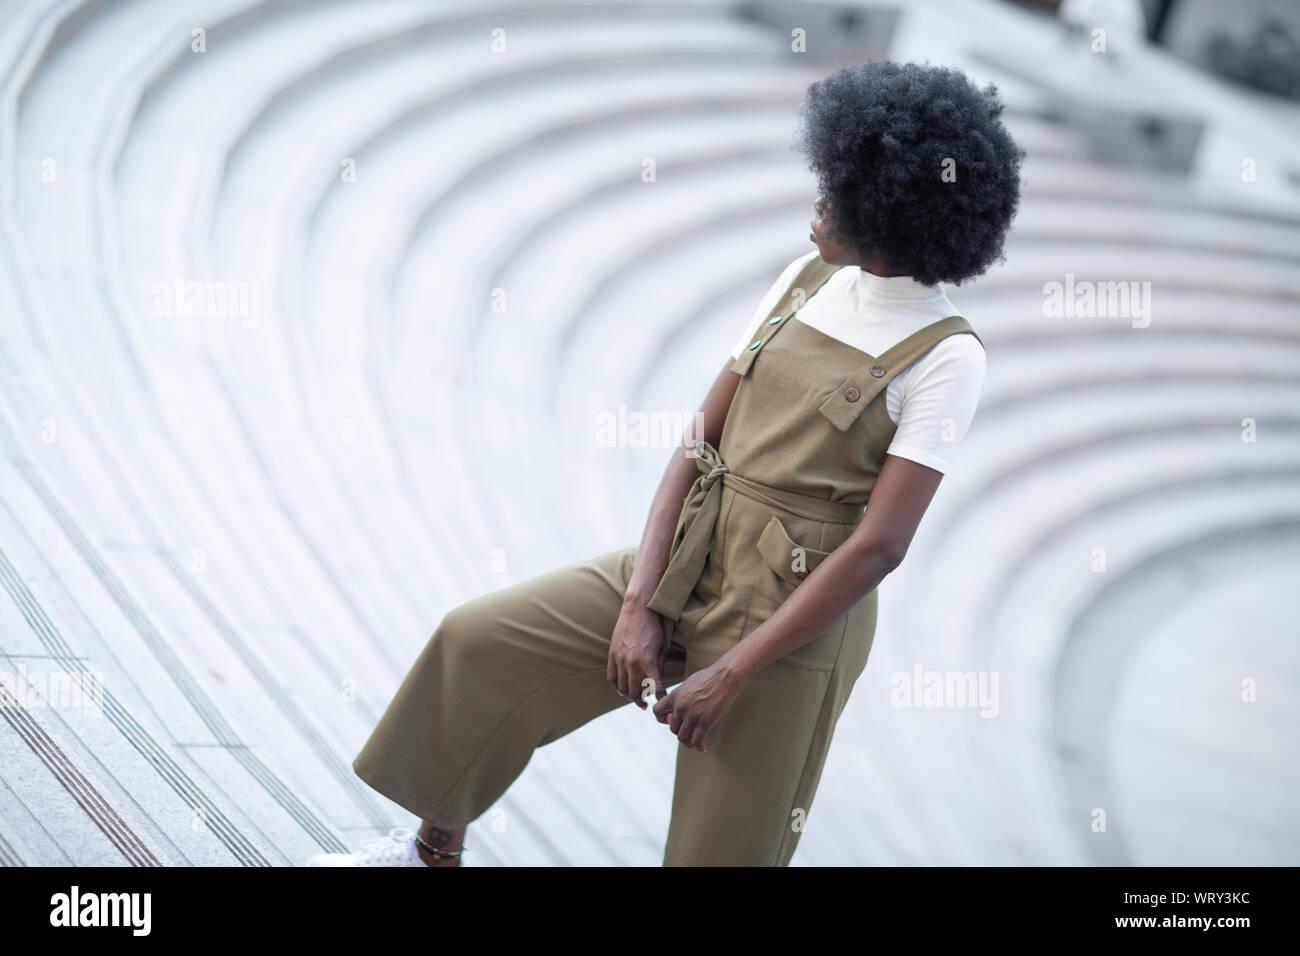 Young and beautiful black girl on an urban landscape, creative fashion shot Stock Photo